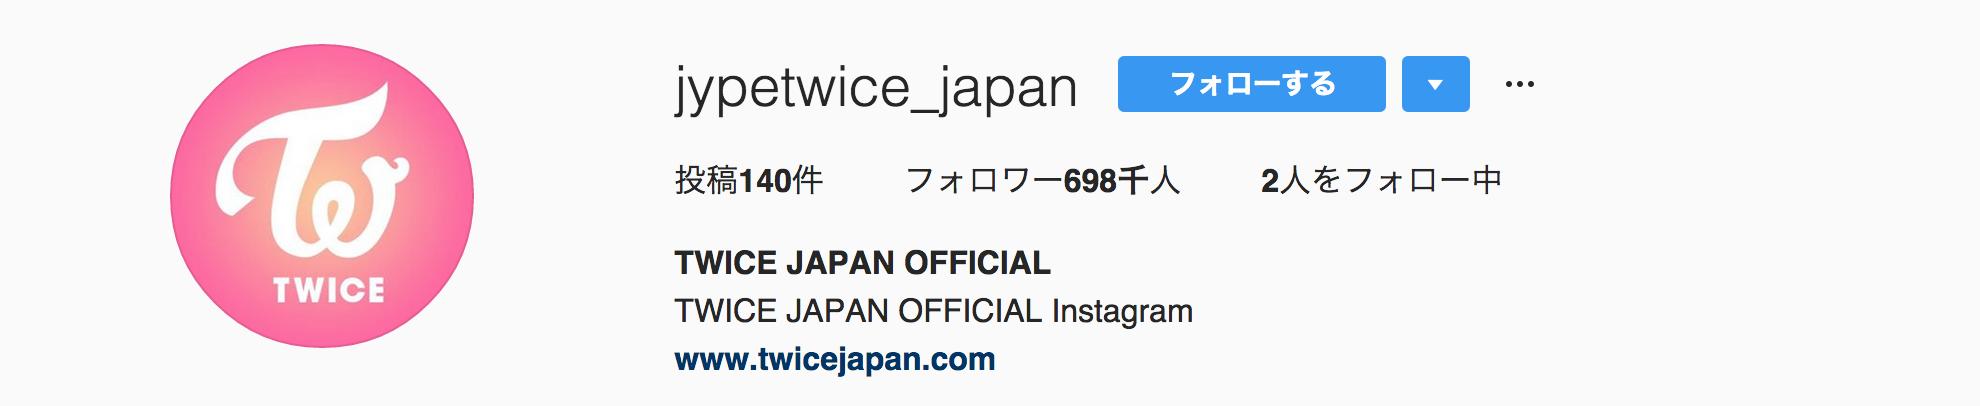 twice-japanofficial-instagram